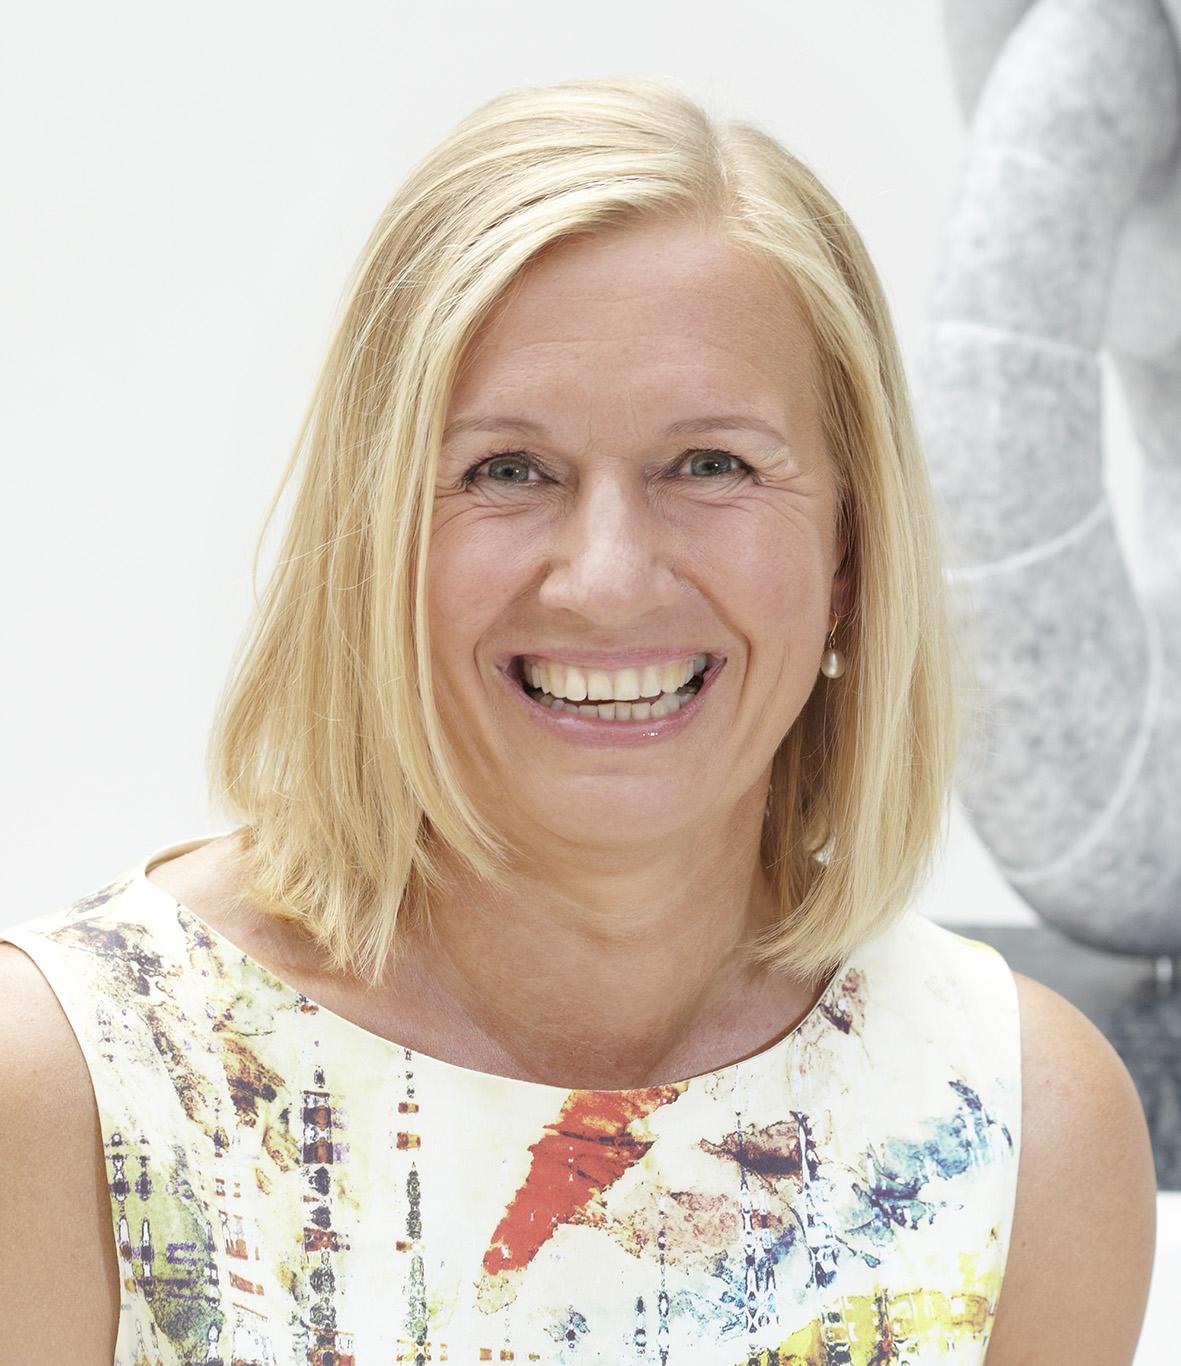 Doris Leuschner (DE)